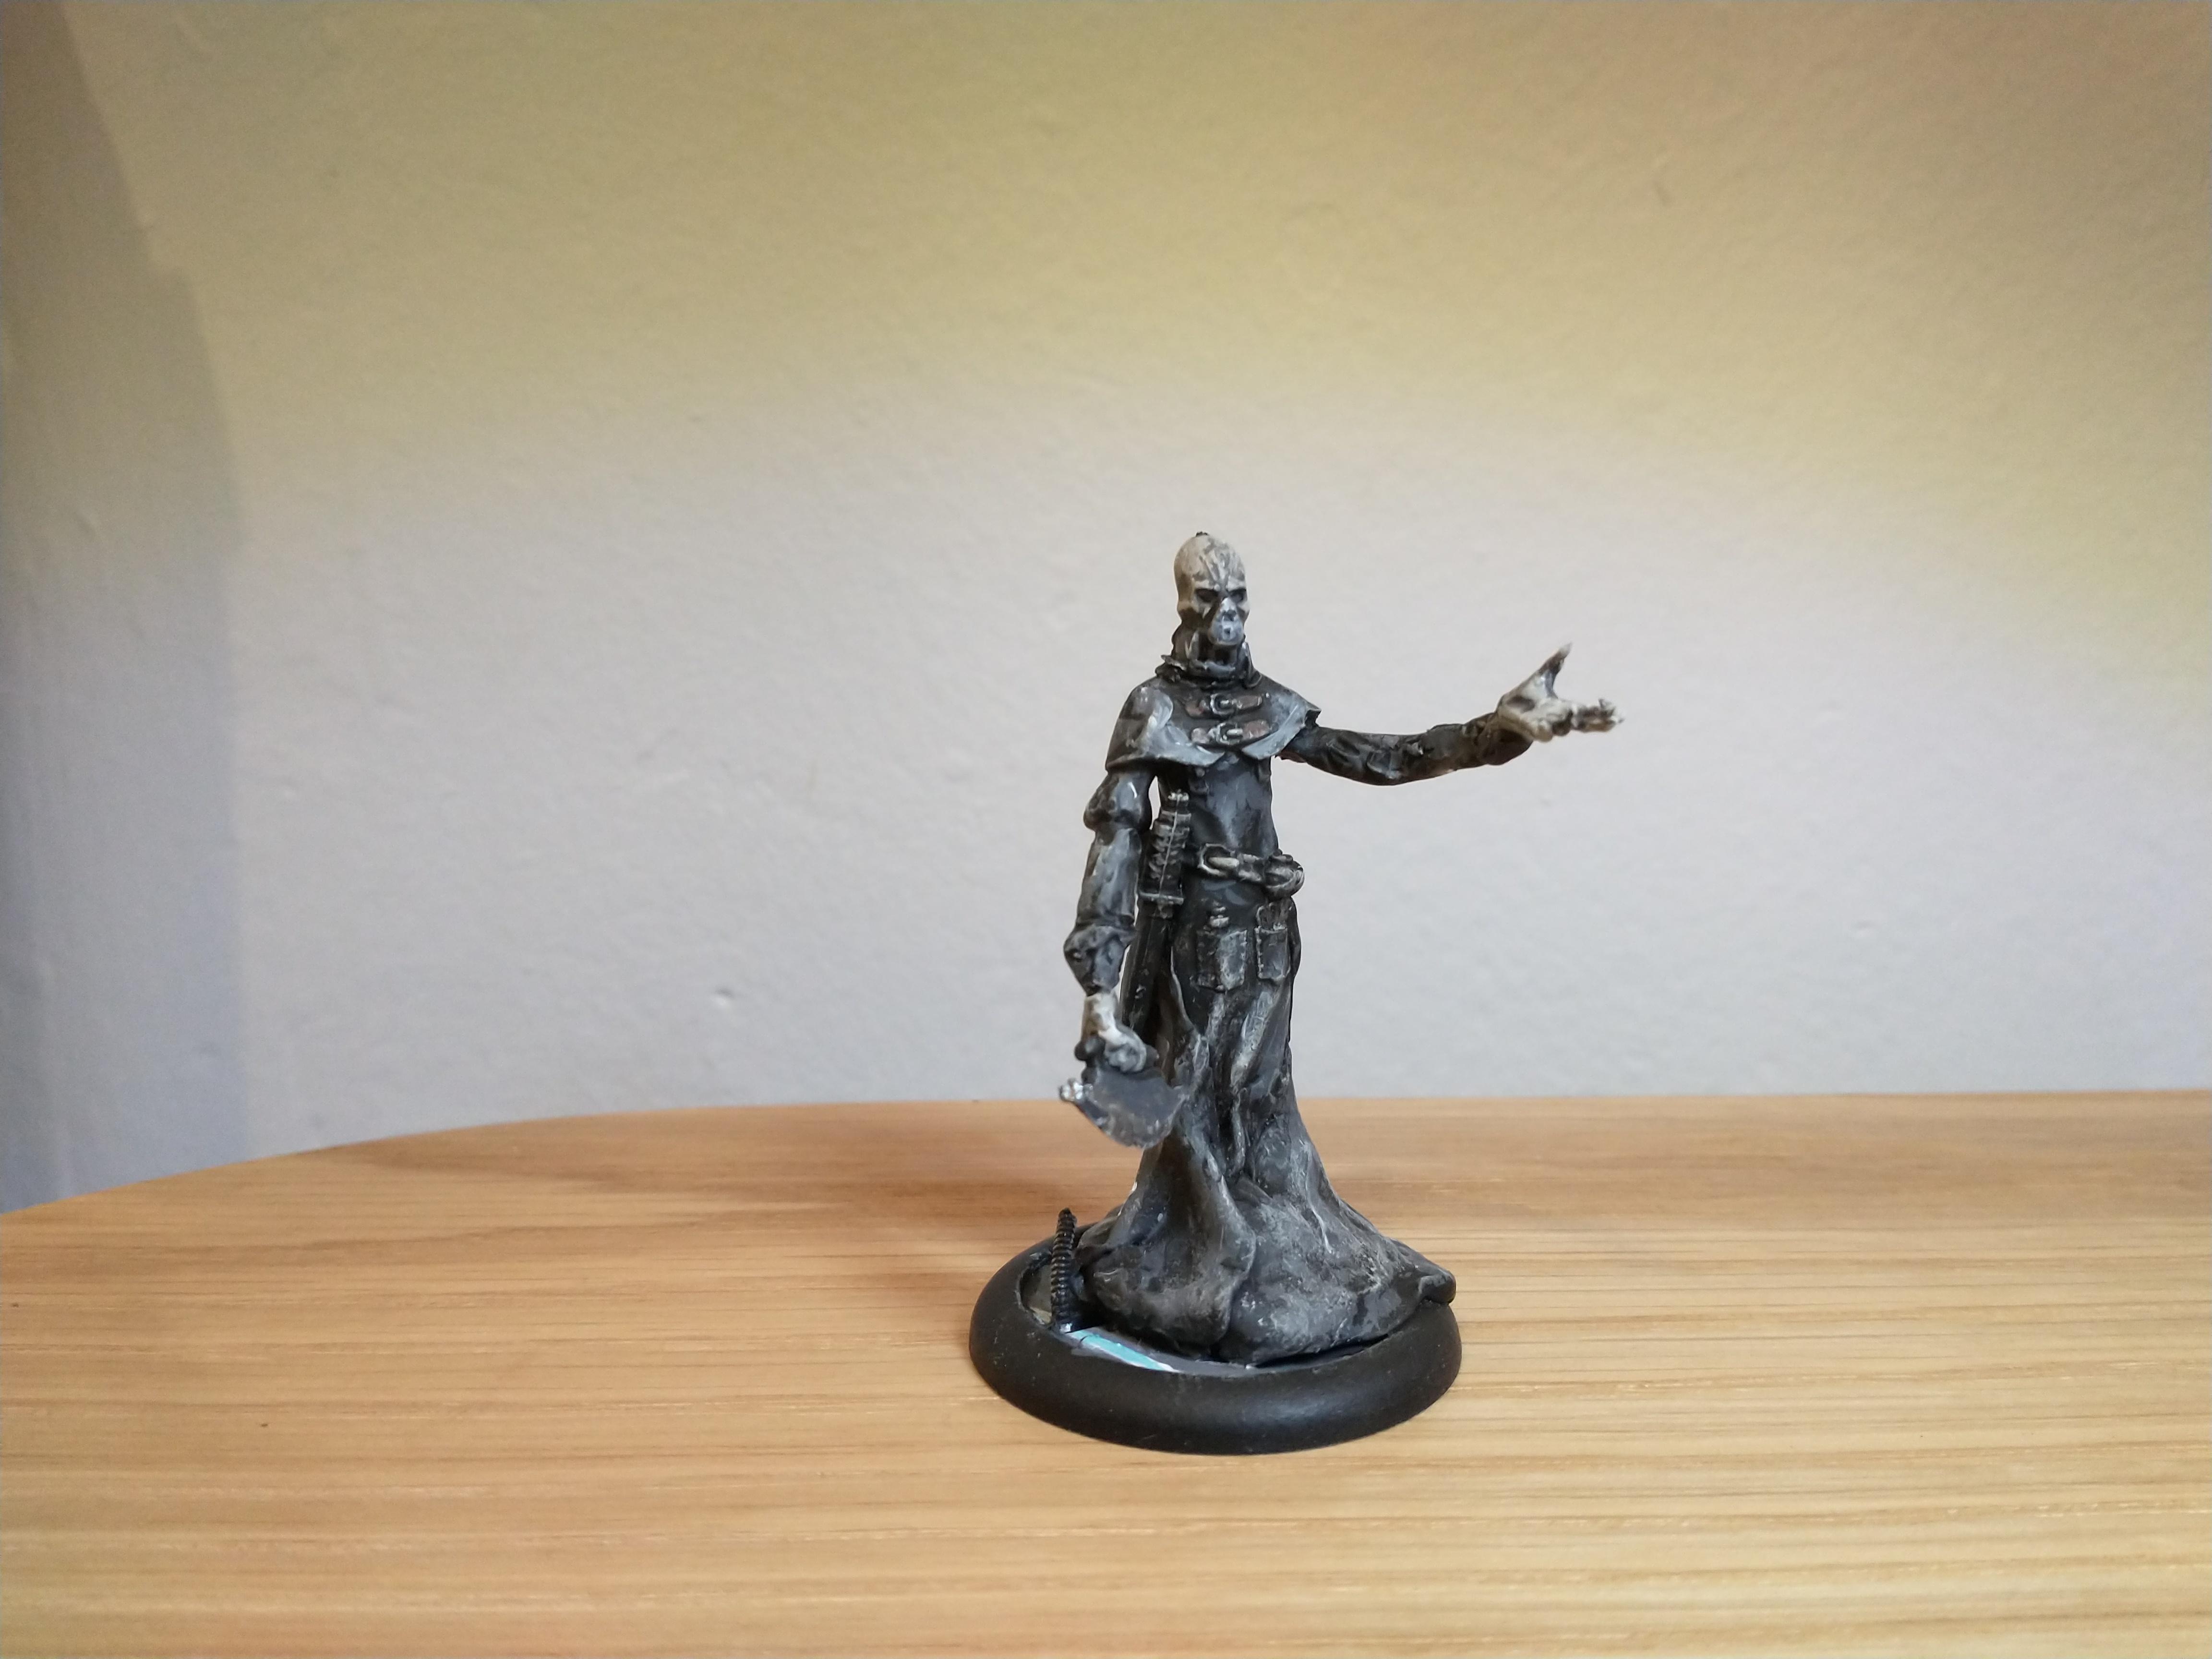 3d Print, Printed Flesh Stalker